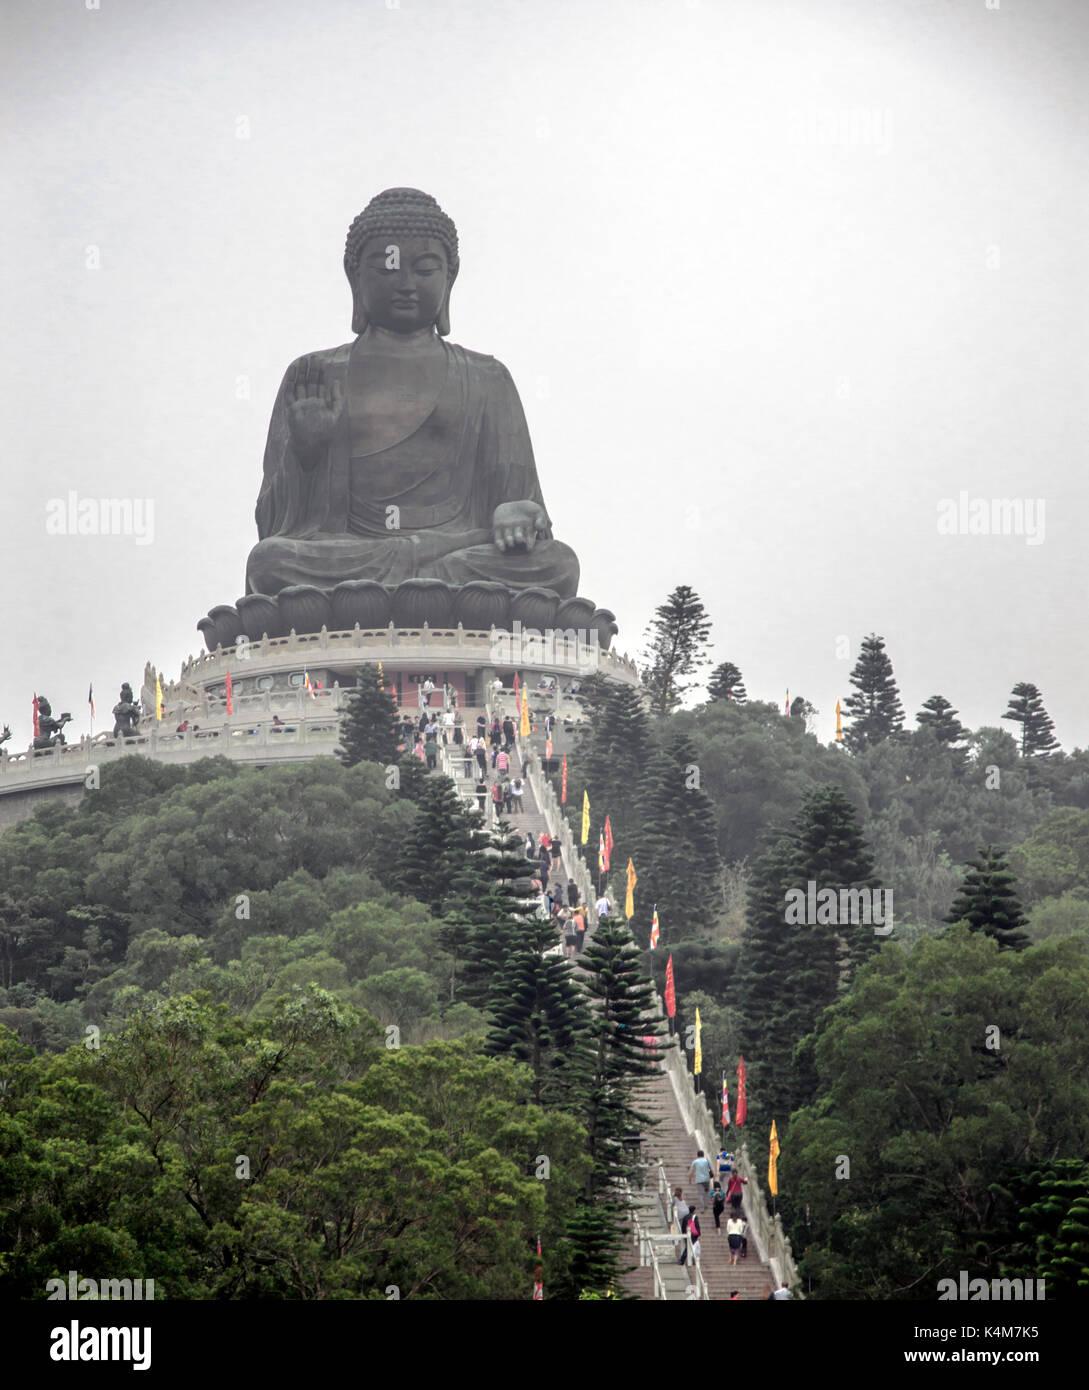 Big Buddha on Lantau island - Stock Image